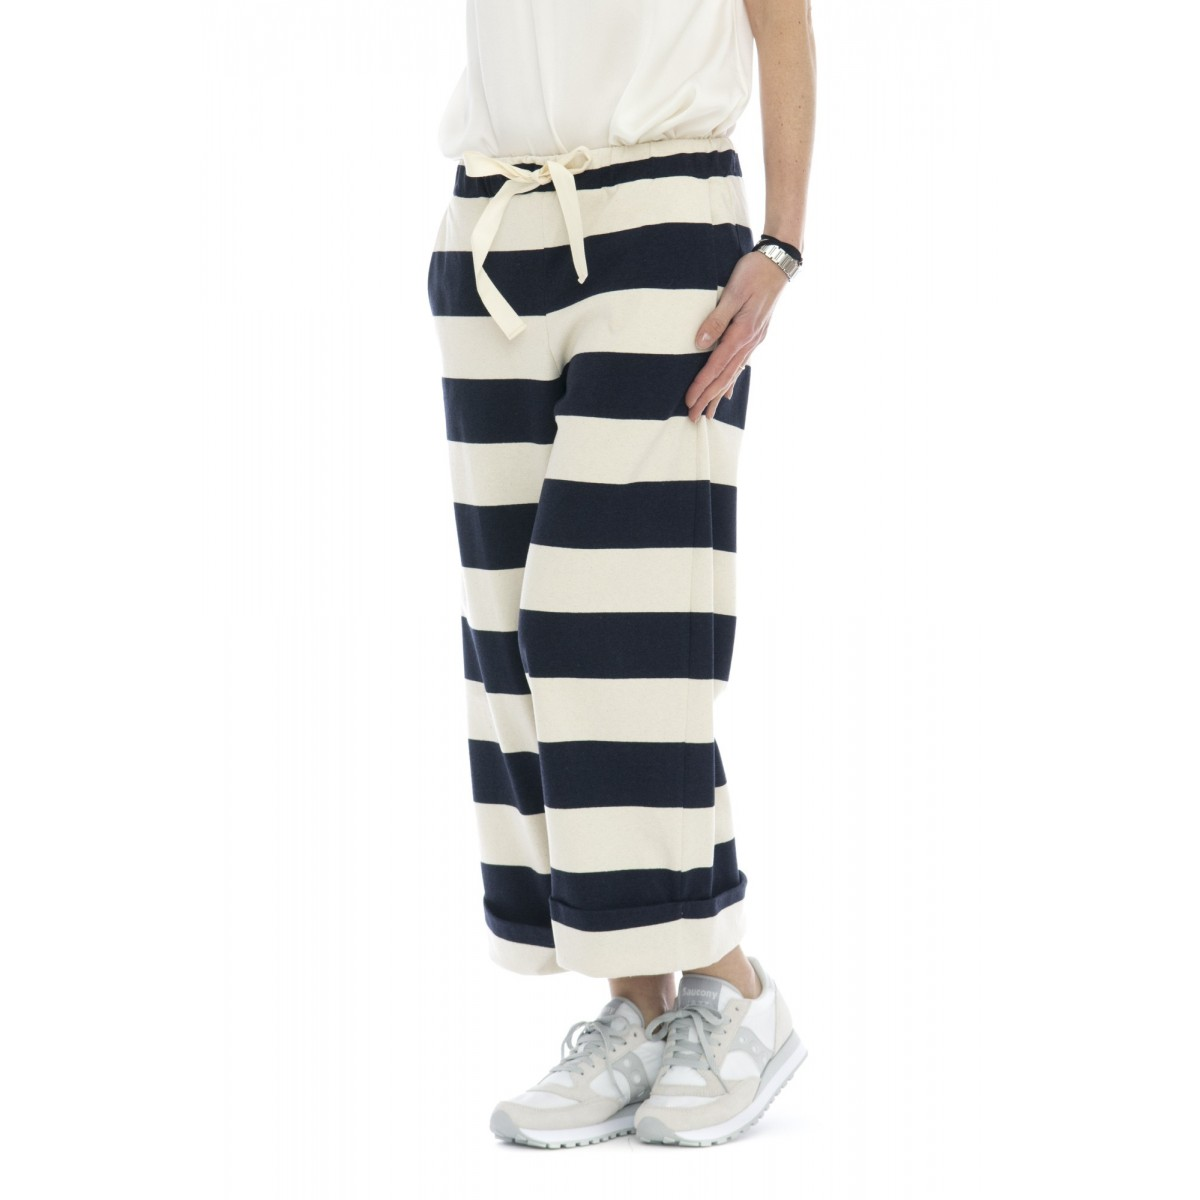 Pantalone donna - 145151 pantalone righe